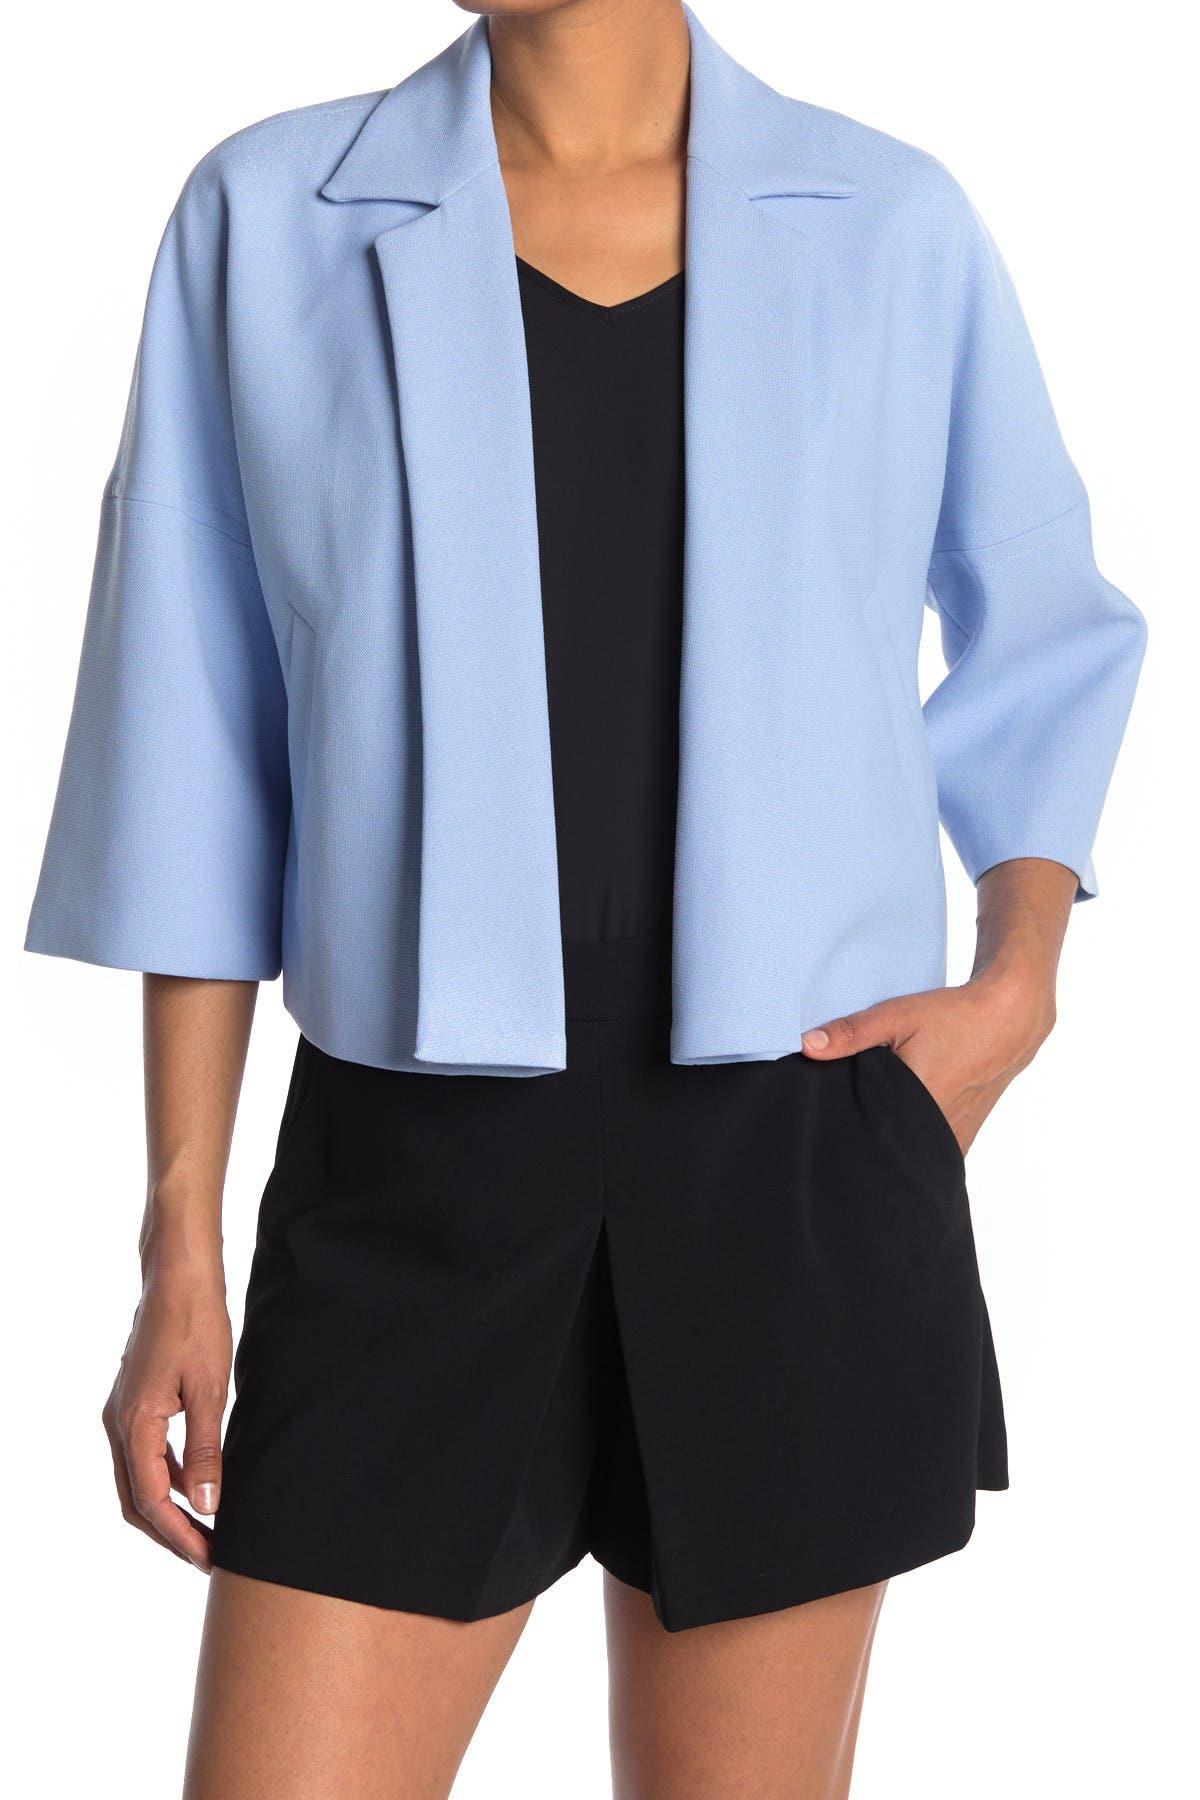 Image of Trina Turk Counoise Jacket